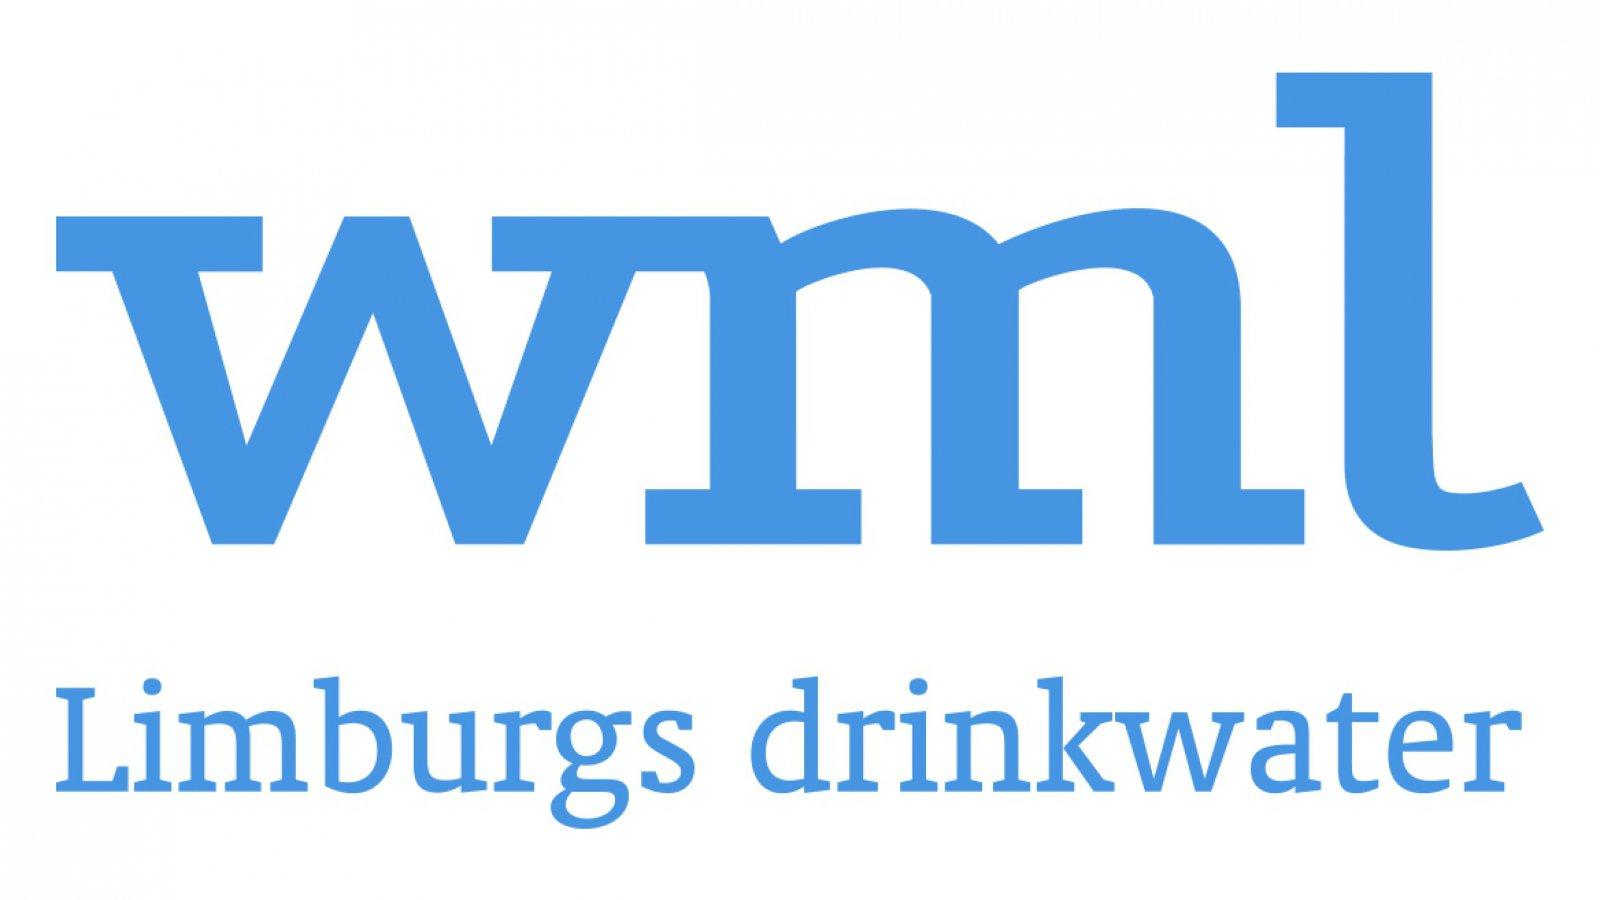 https://www.waterforlife.nl/files/visuals/_1600x900_fit_center-center_85_none/logo-website-16_9.jpg